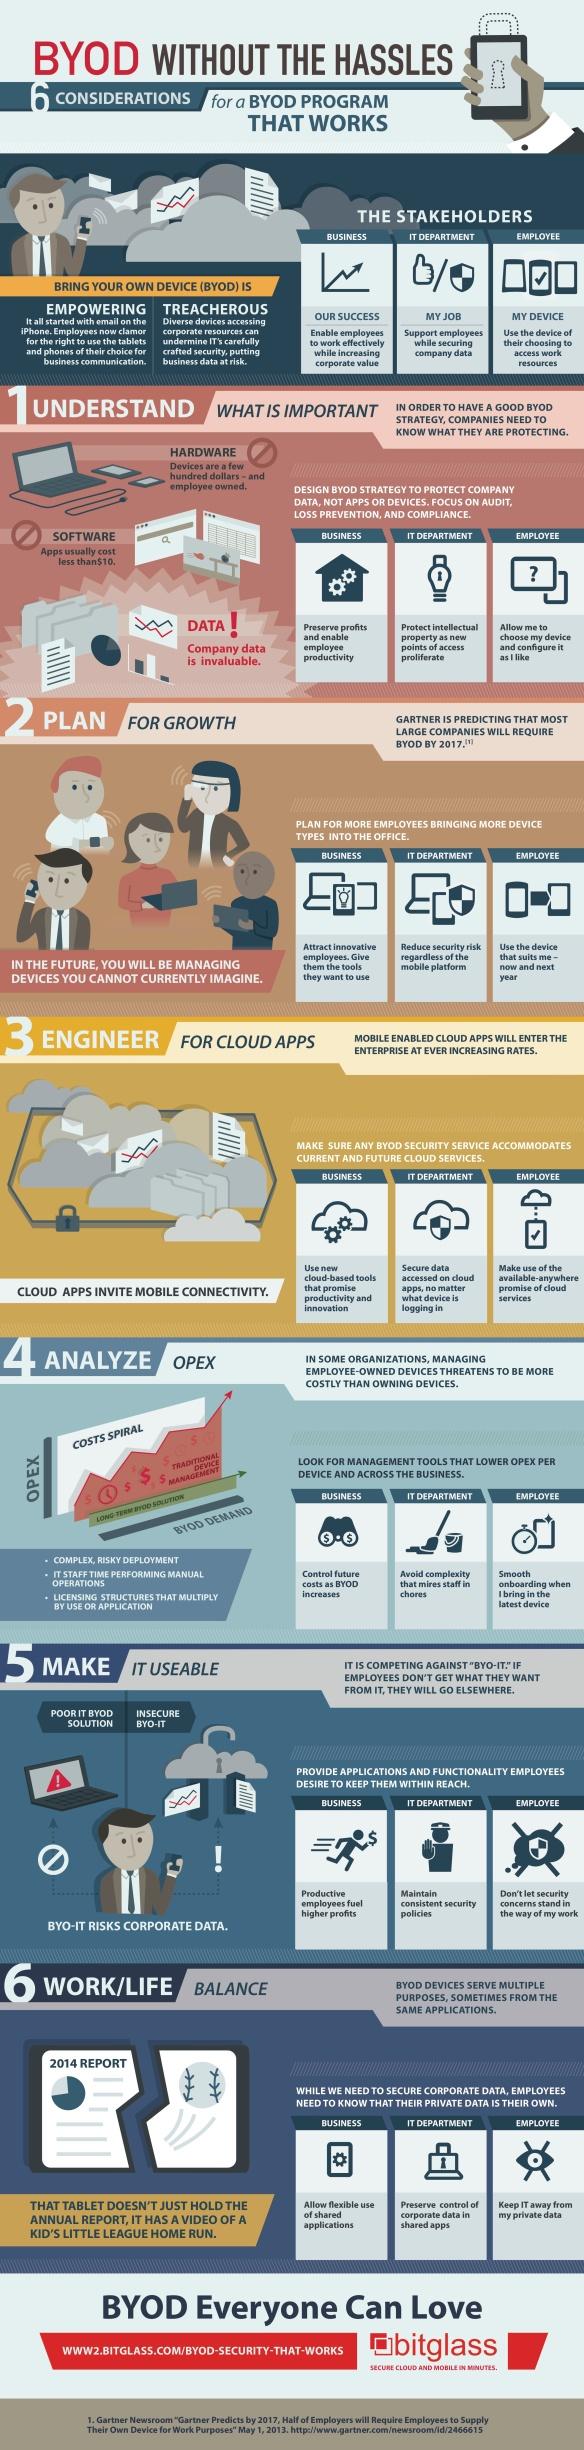 Bitglass_BYOD_6considerations-Infograph_FNL